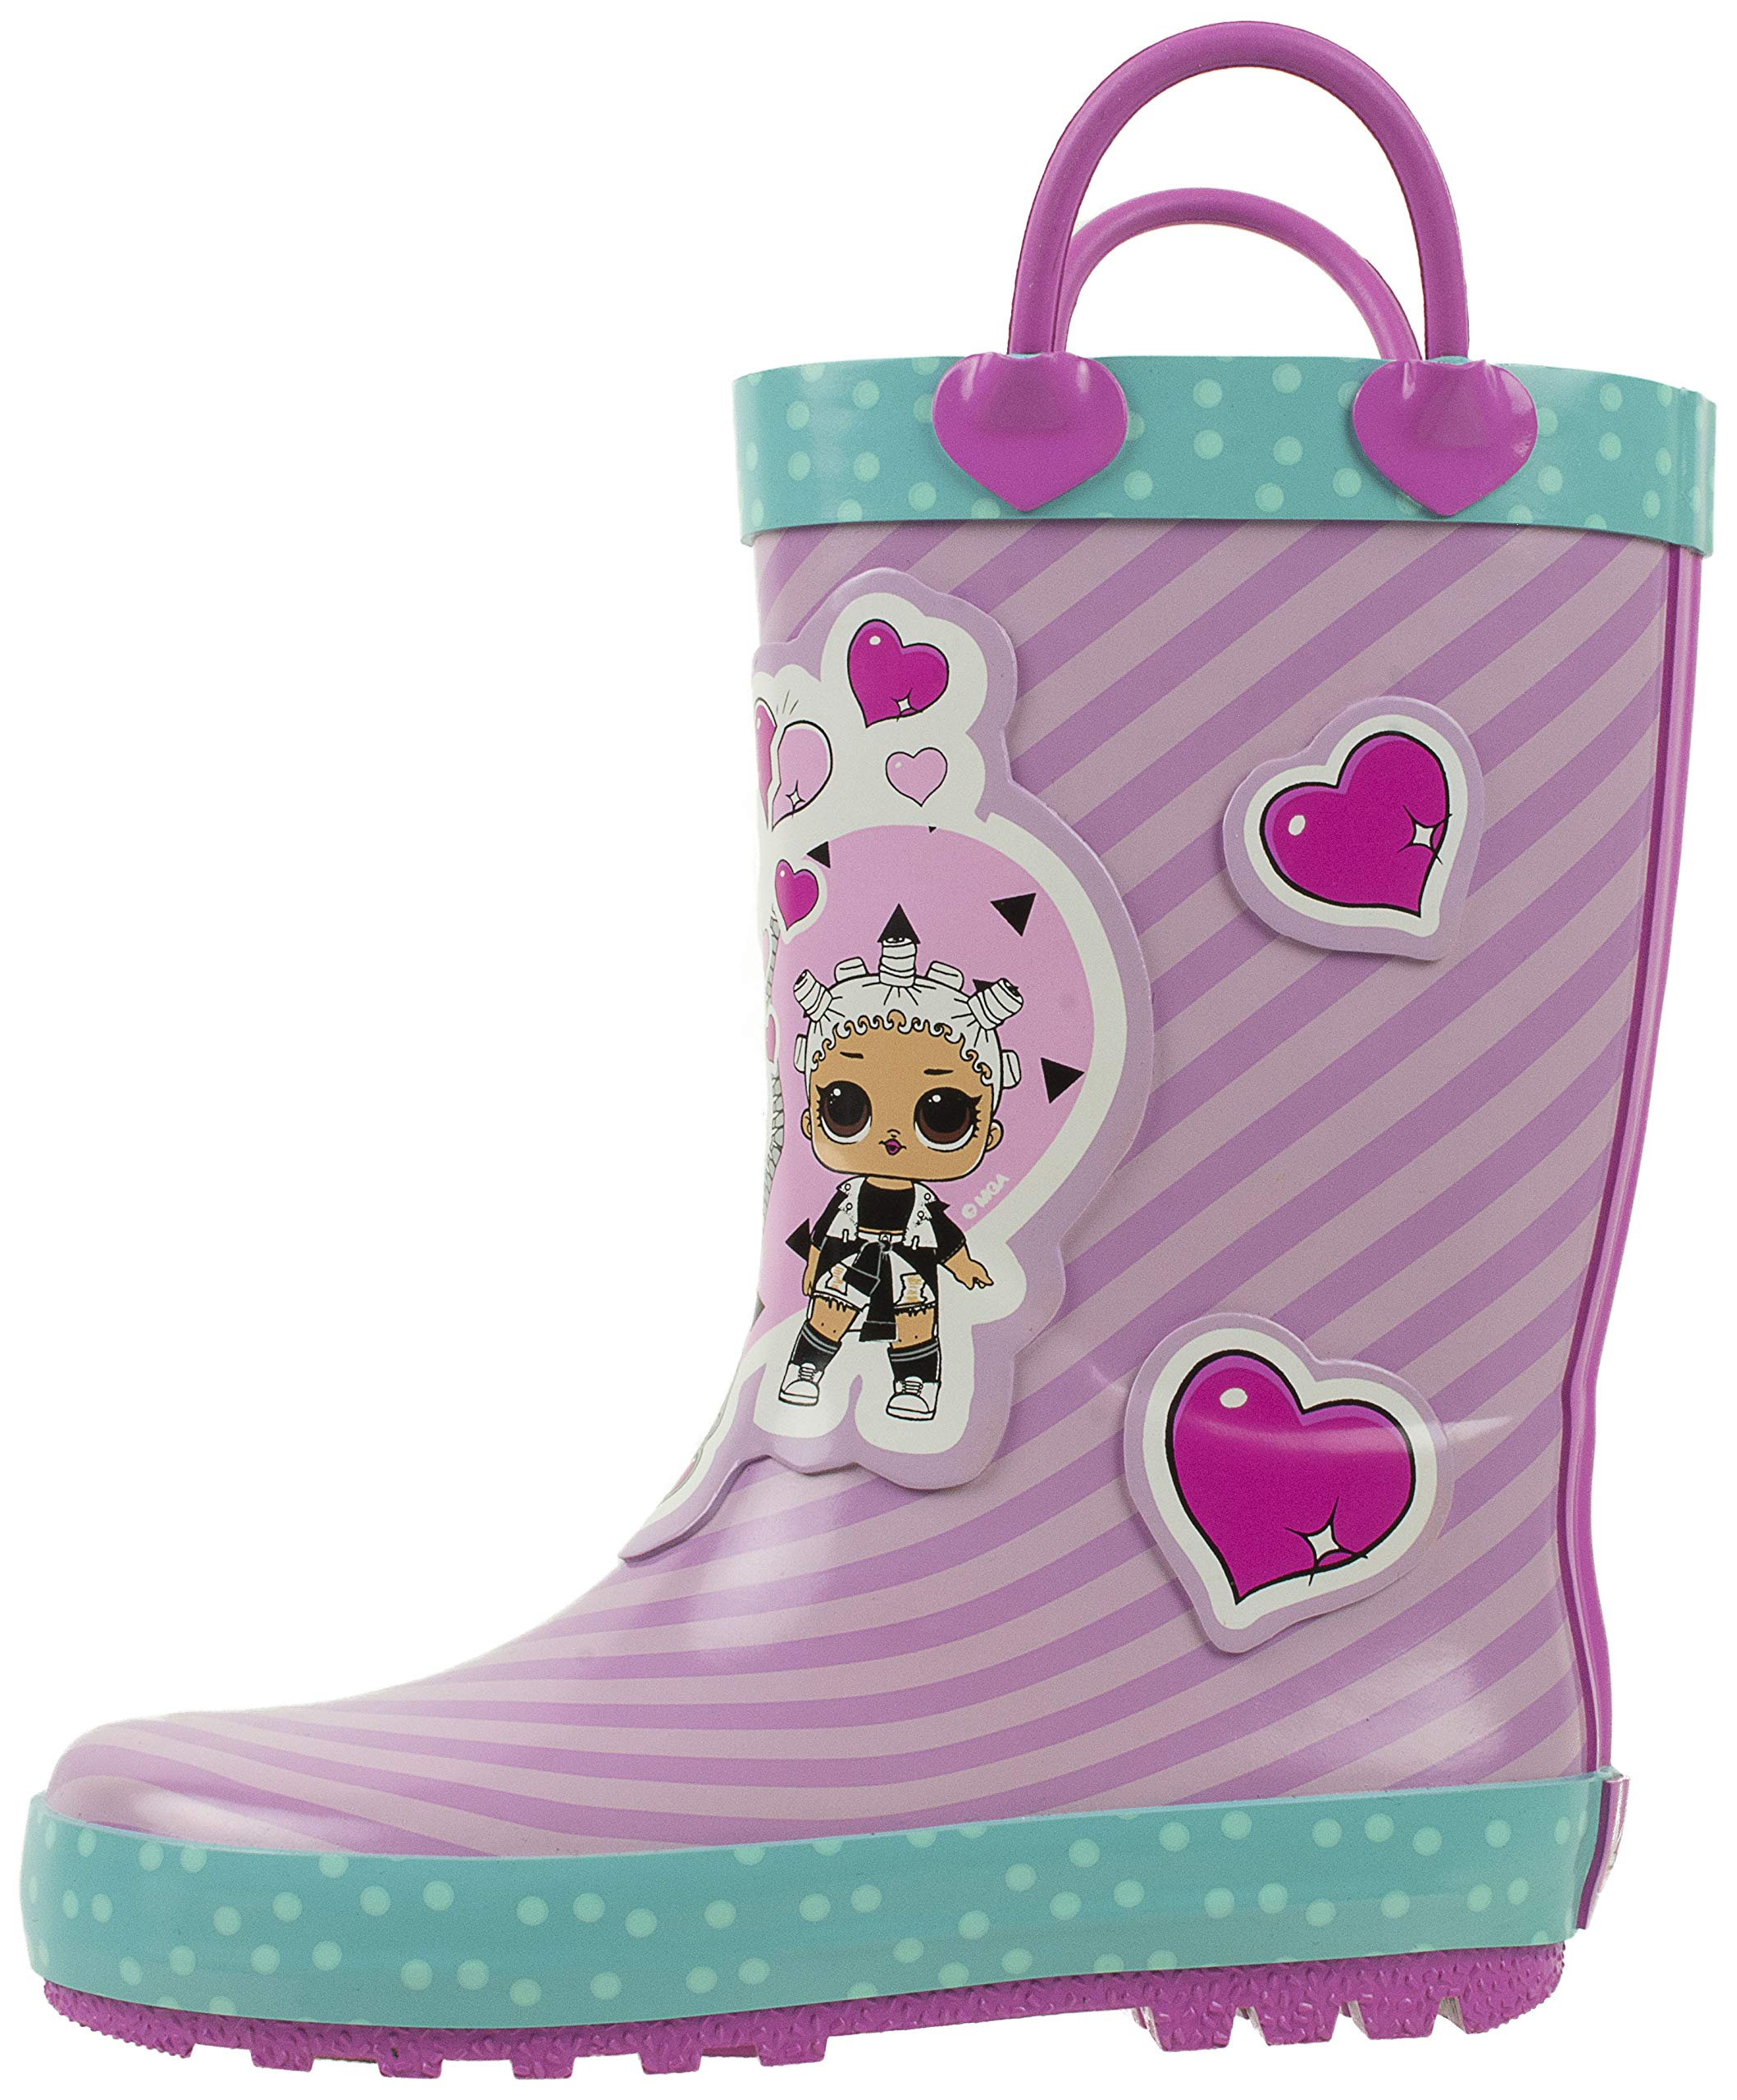 L.O.L Surprise! Girls Rainboots,Fancy and Fresh,100% Rubber,Waterproof,Easy-on Handles,Purple Pink,Little Kid Size 11/12 by L.O.L Surprise!